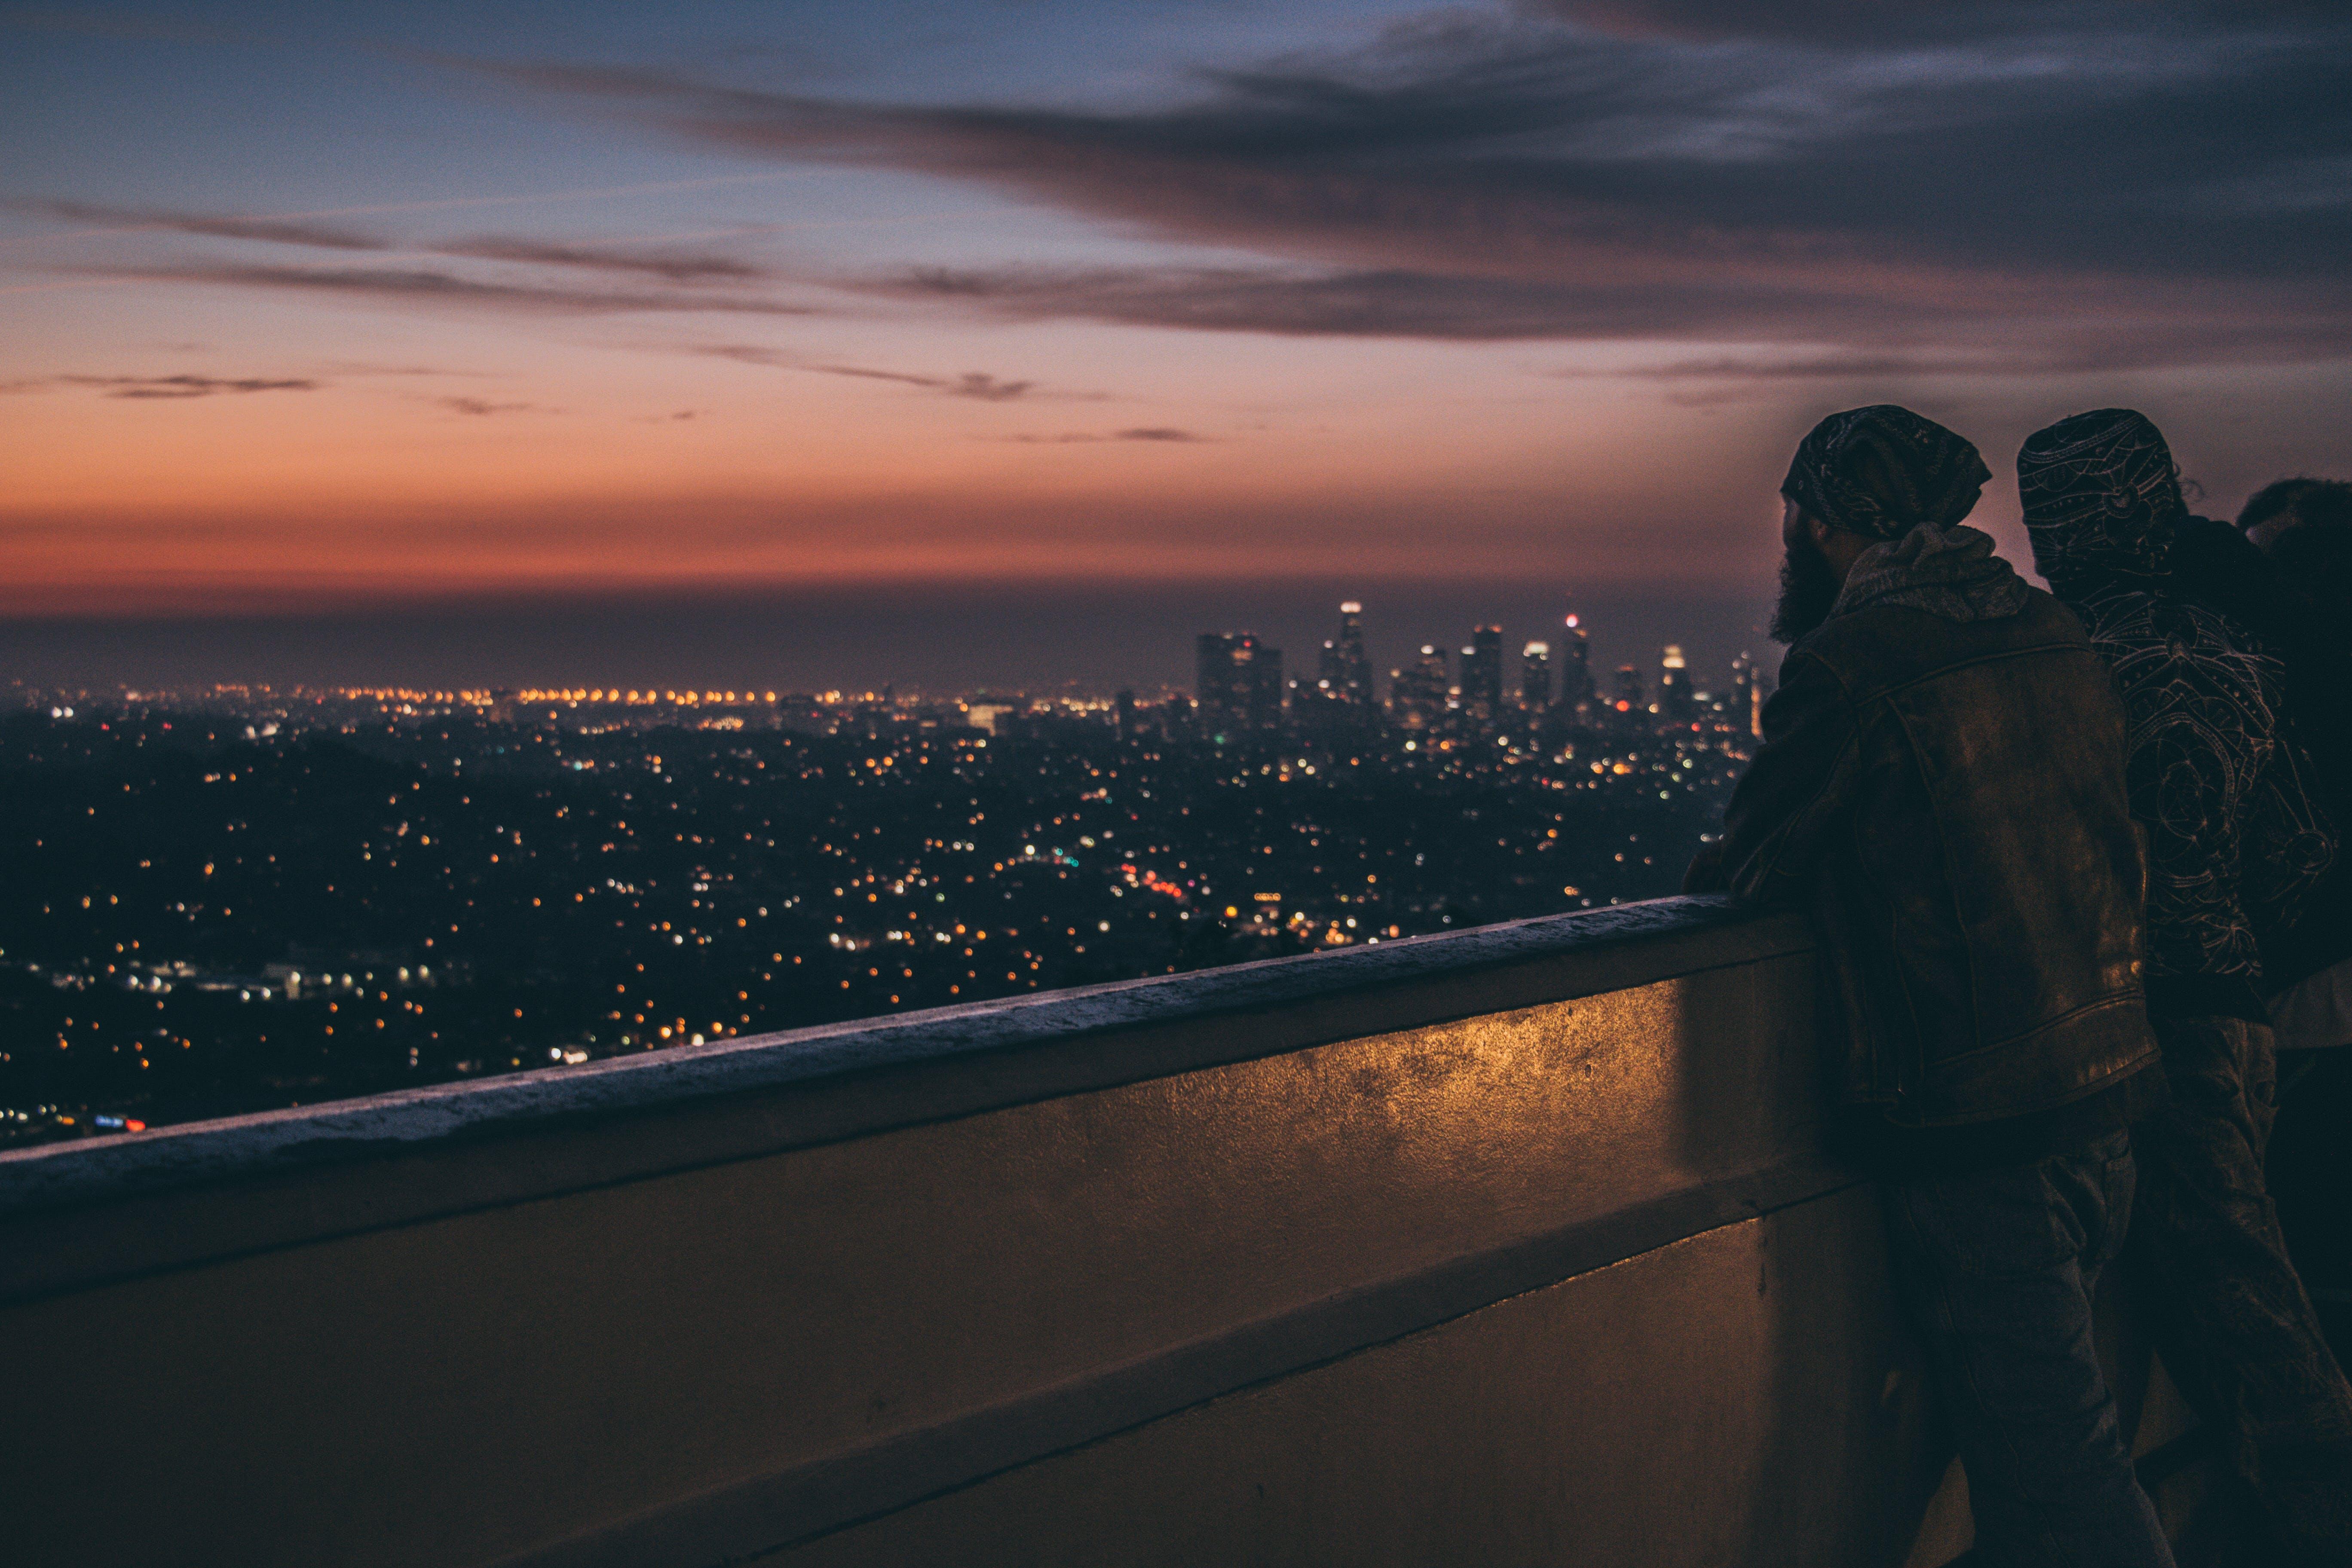 Kostenloses Stock Foto zu abend, balkon, beleuchtet, dämmerung